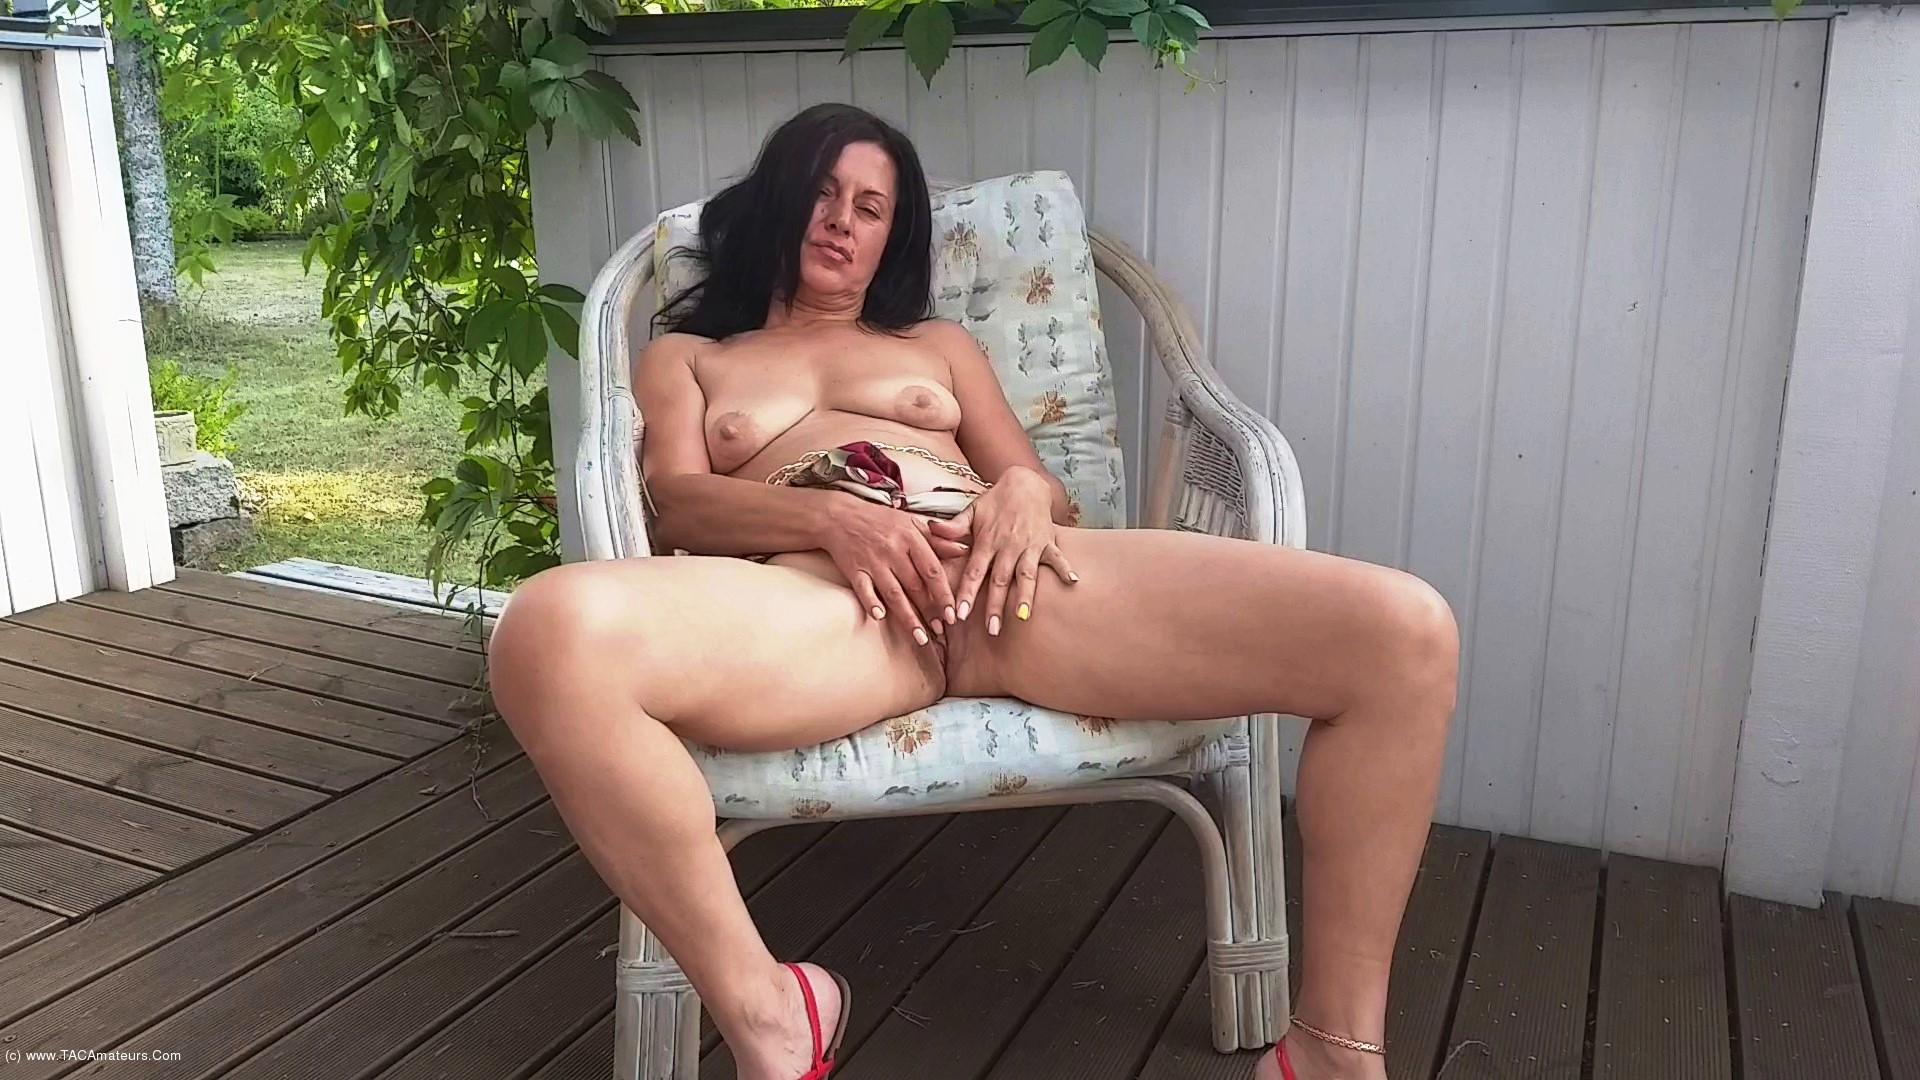 DianaAnanta - Outdoor Masturbation scene 2